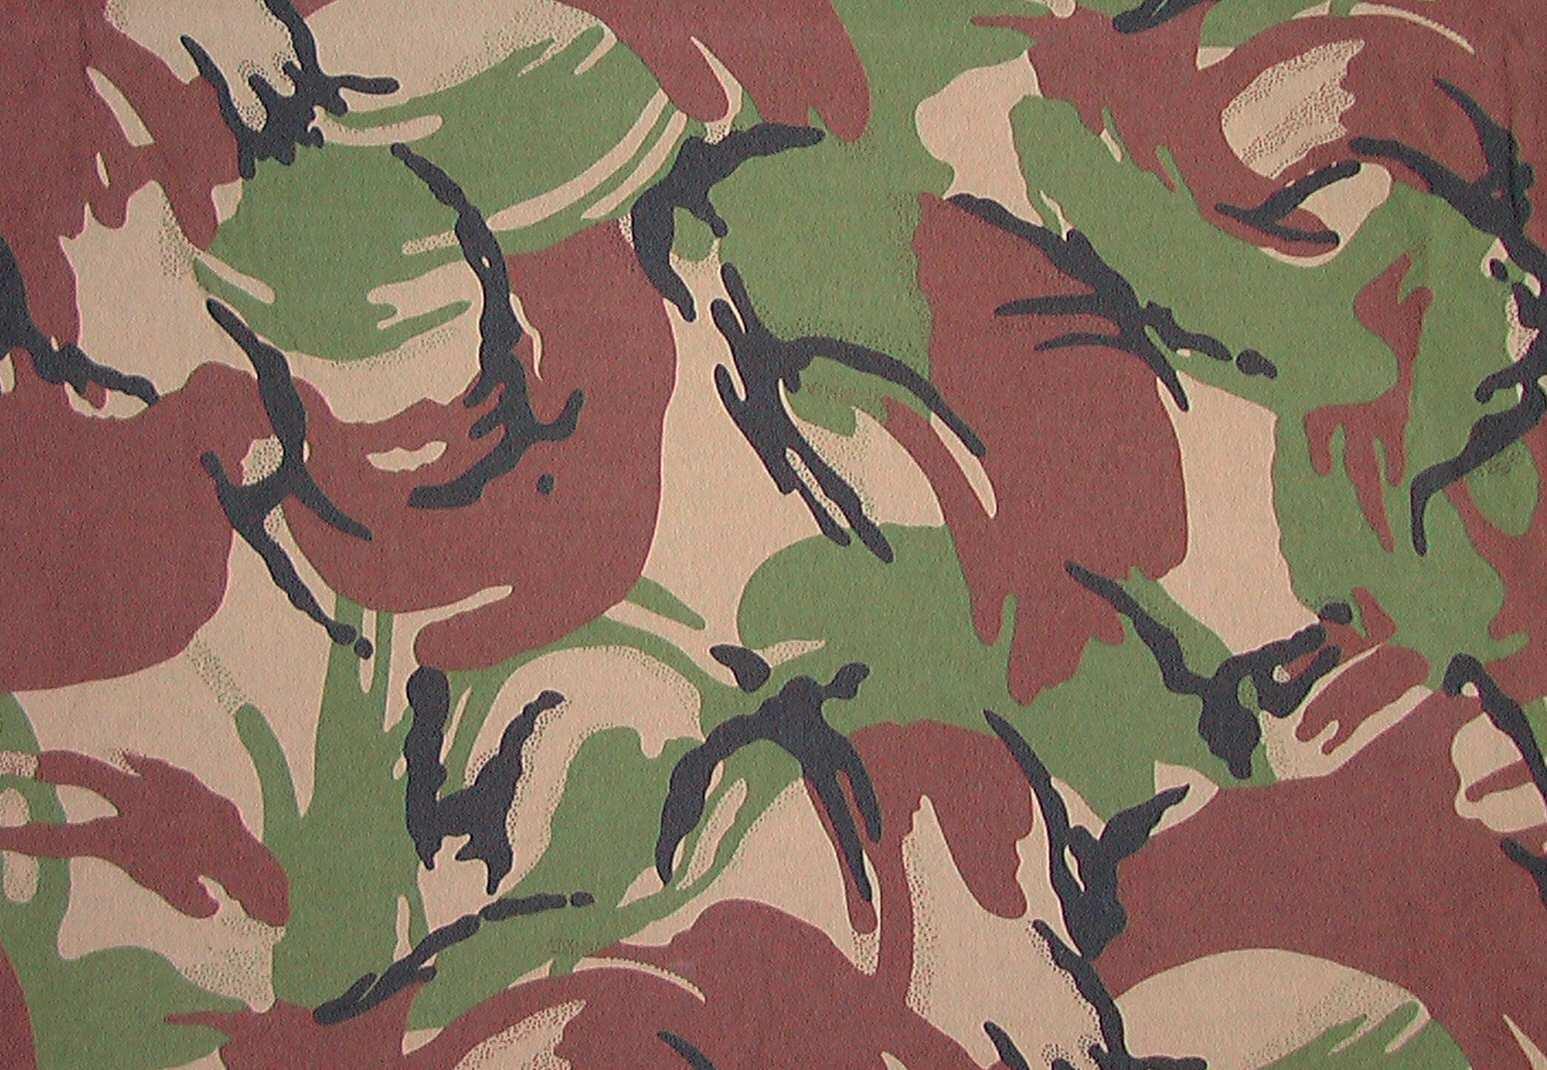 British Disruptive Pattern Material (DPM) Camo wallpaper